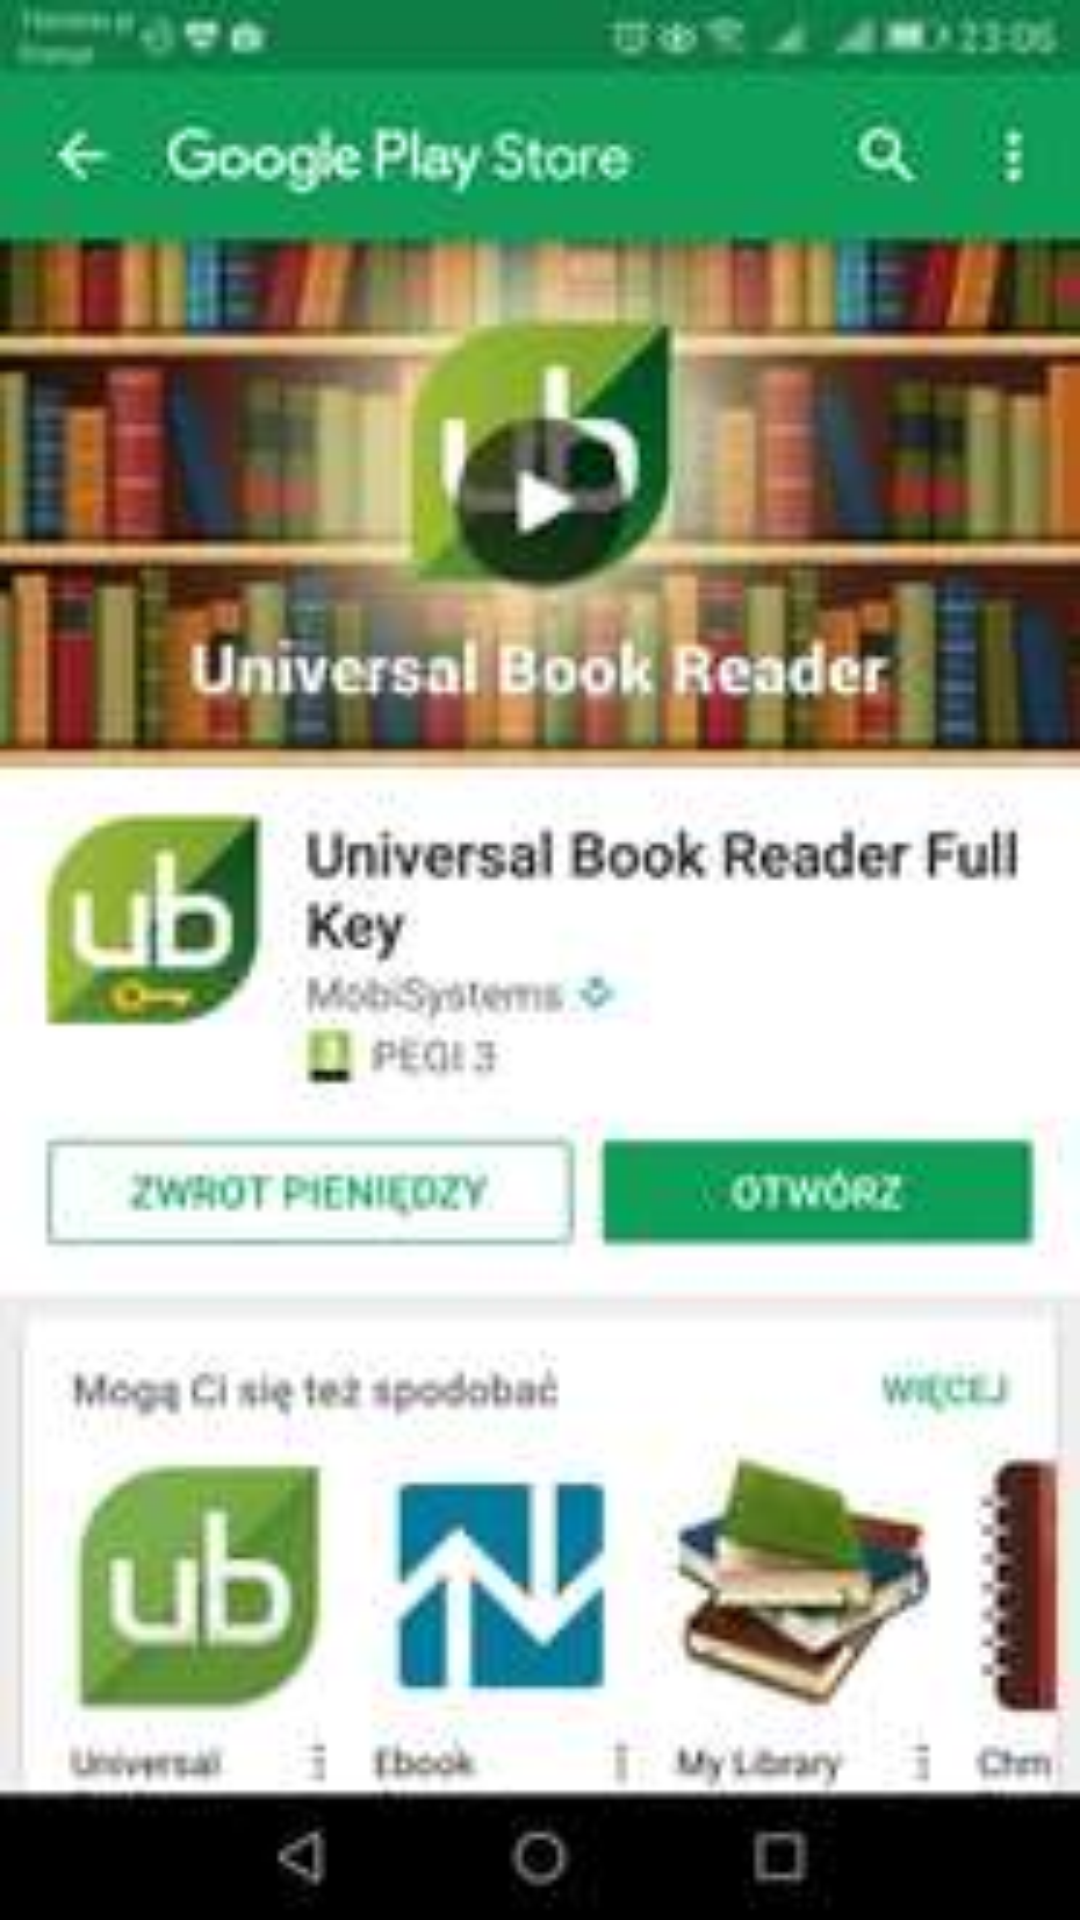 Universal Book Reader Full